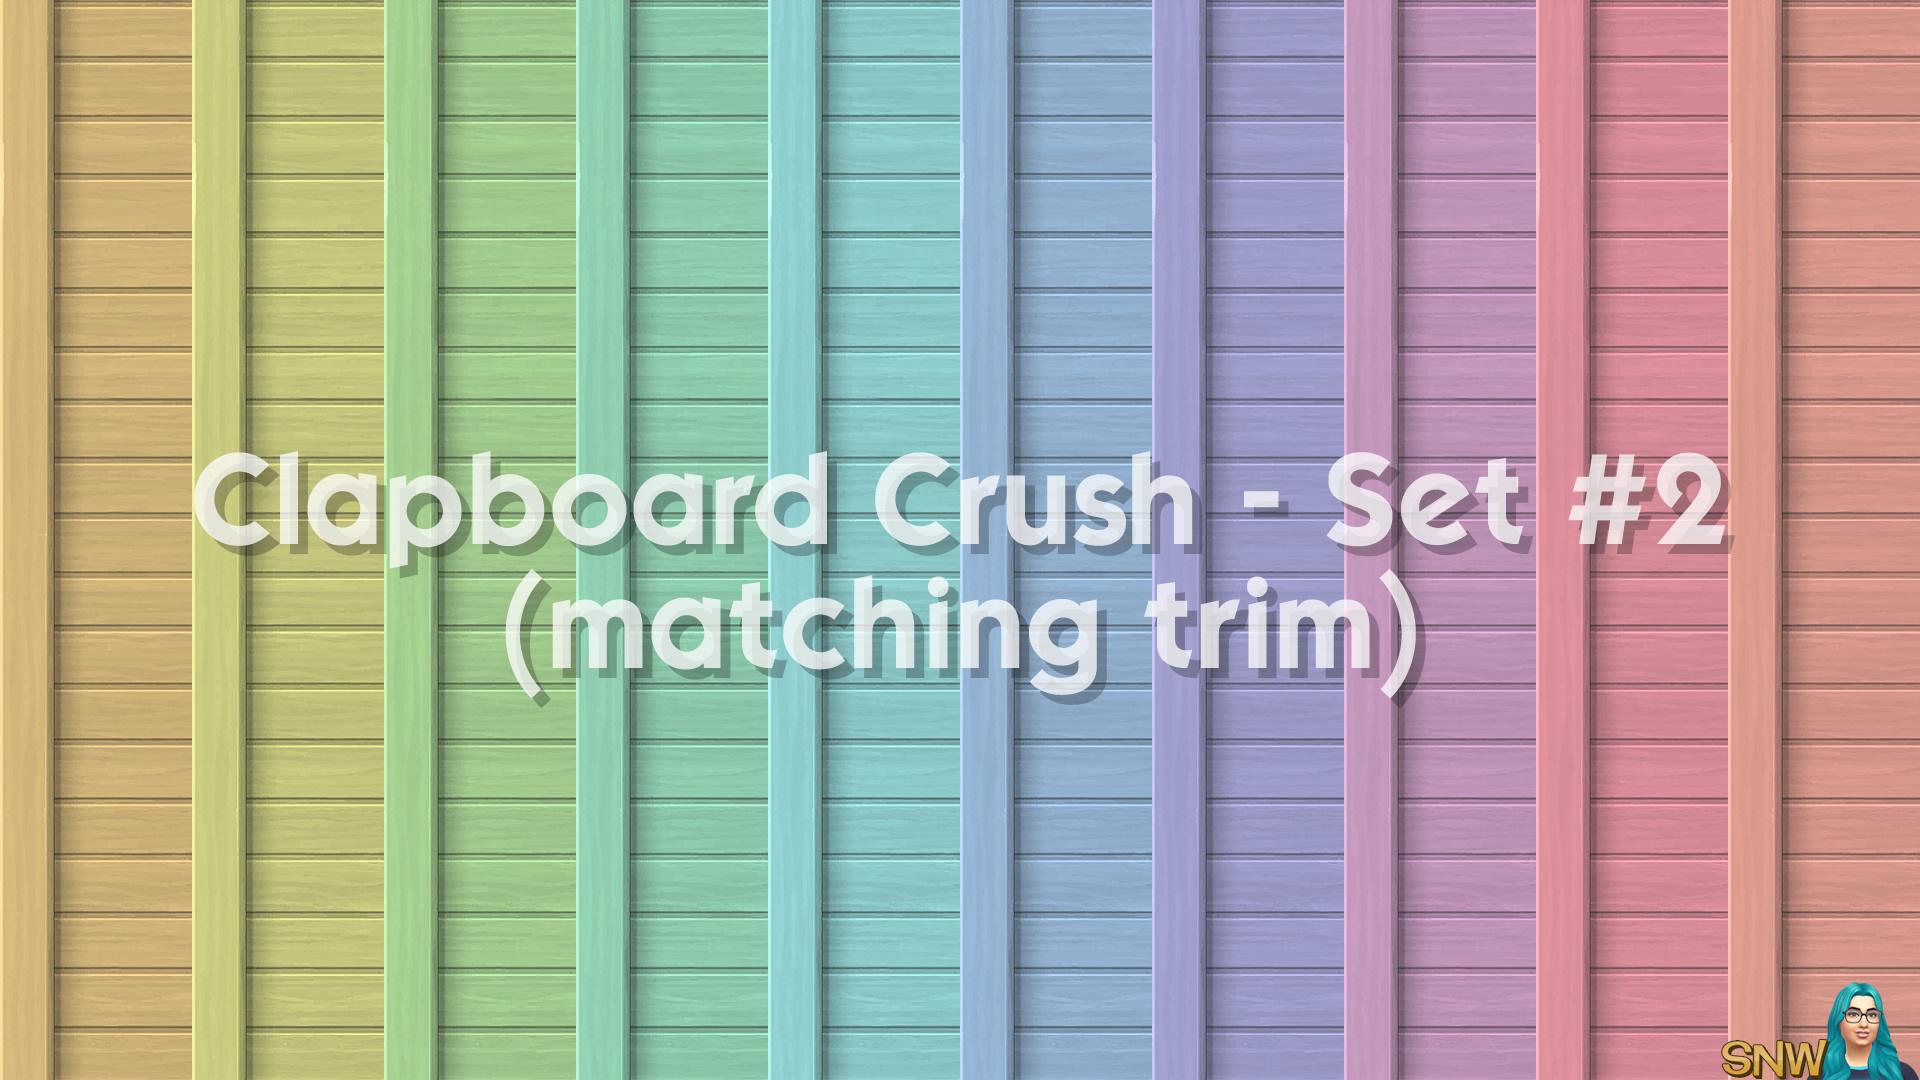 Clapboard Crush Siding Walls Set #2 (with Corner Trim)